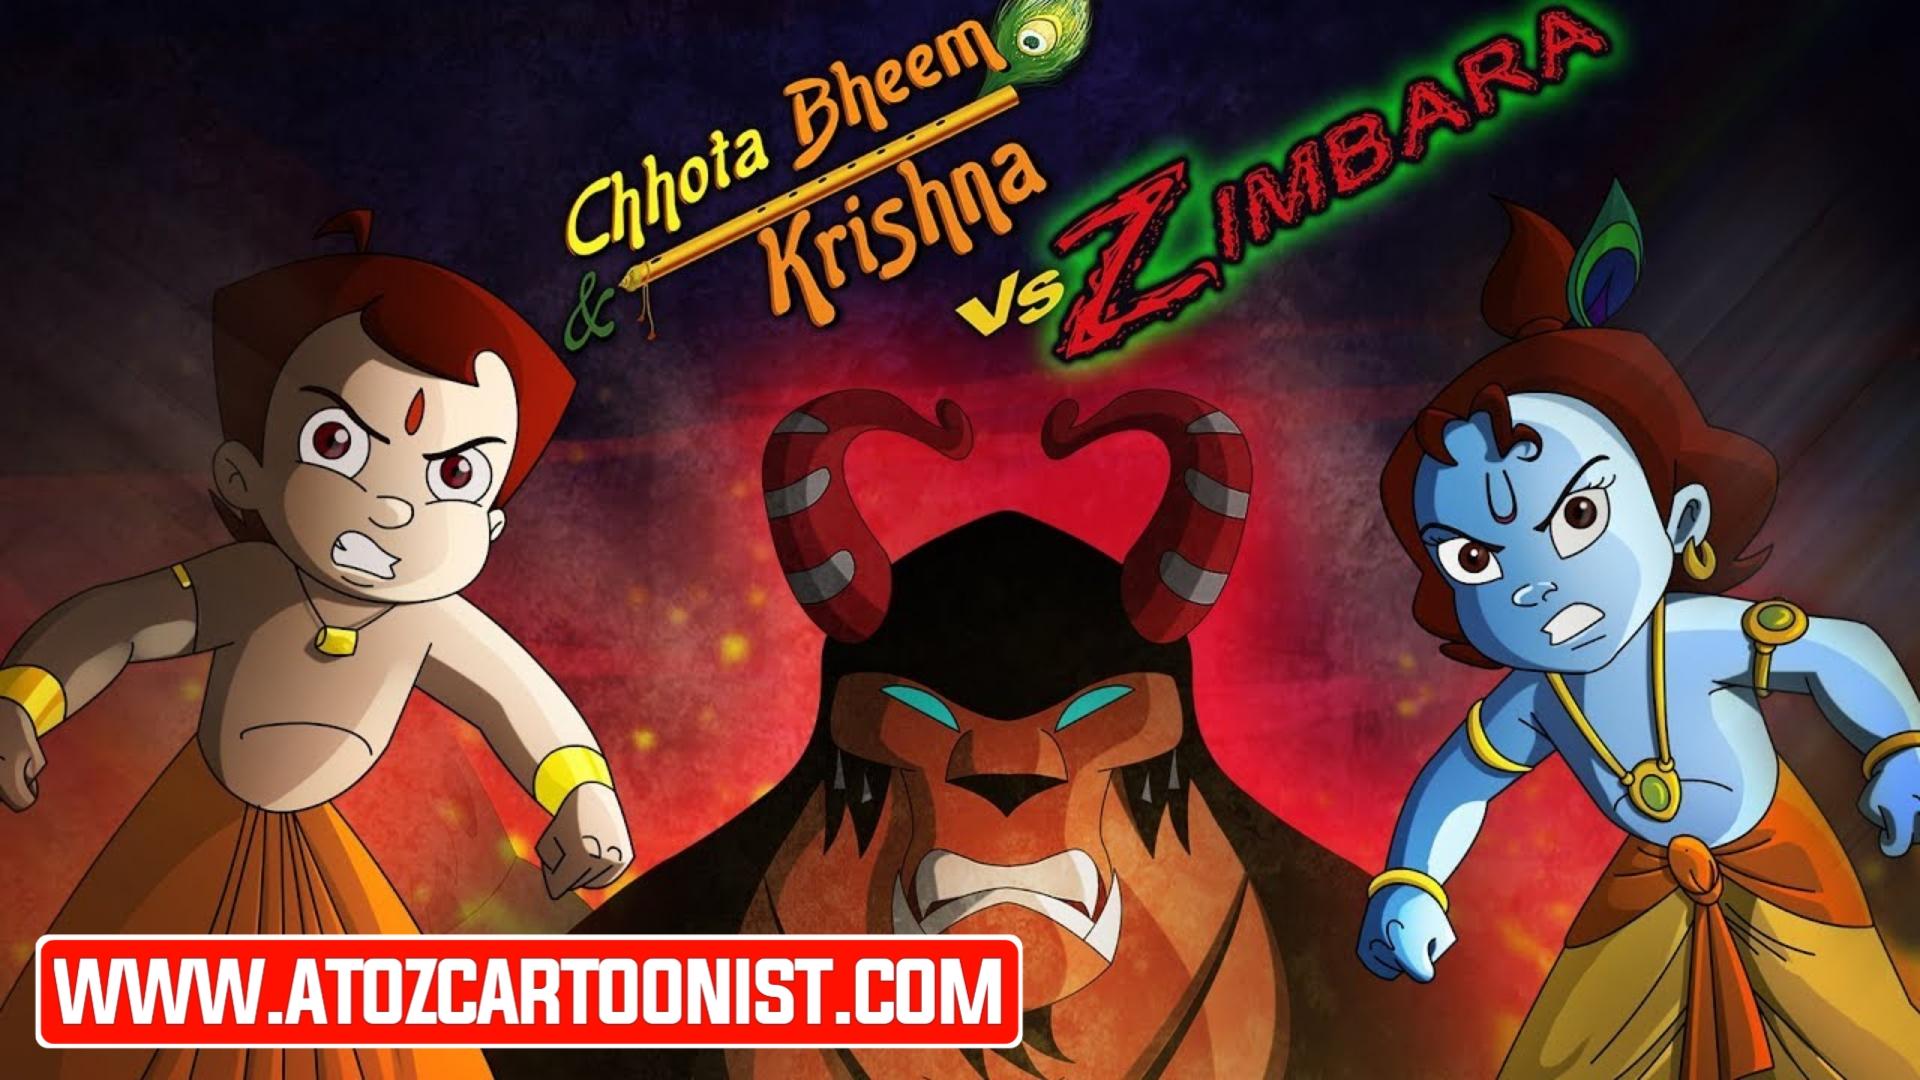 CHHOTA BHEEM AUR KRISHNA VS ZIMBARA FULL MOVIE IN HINDI & TAMIL DOWNLOAD (480P, 720P & 1080P)